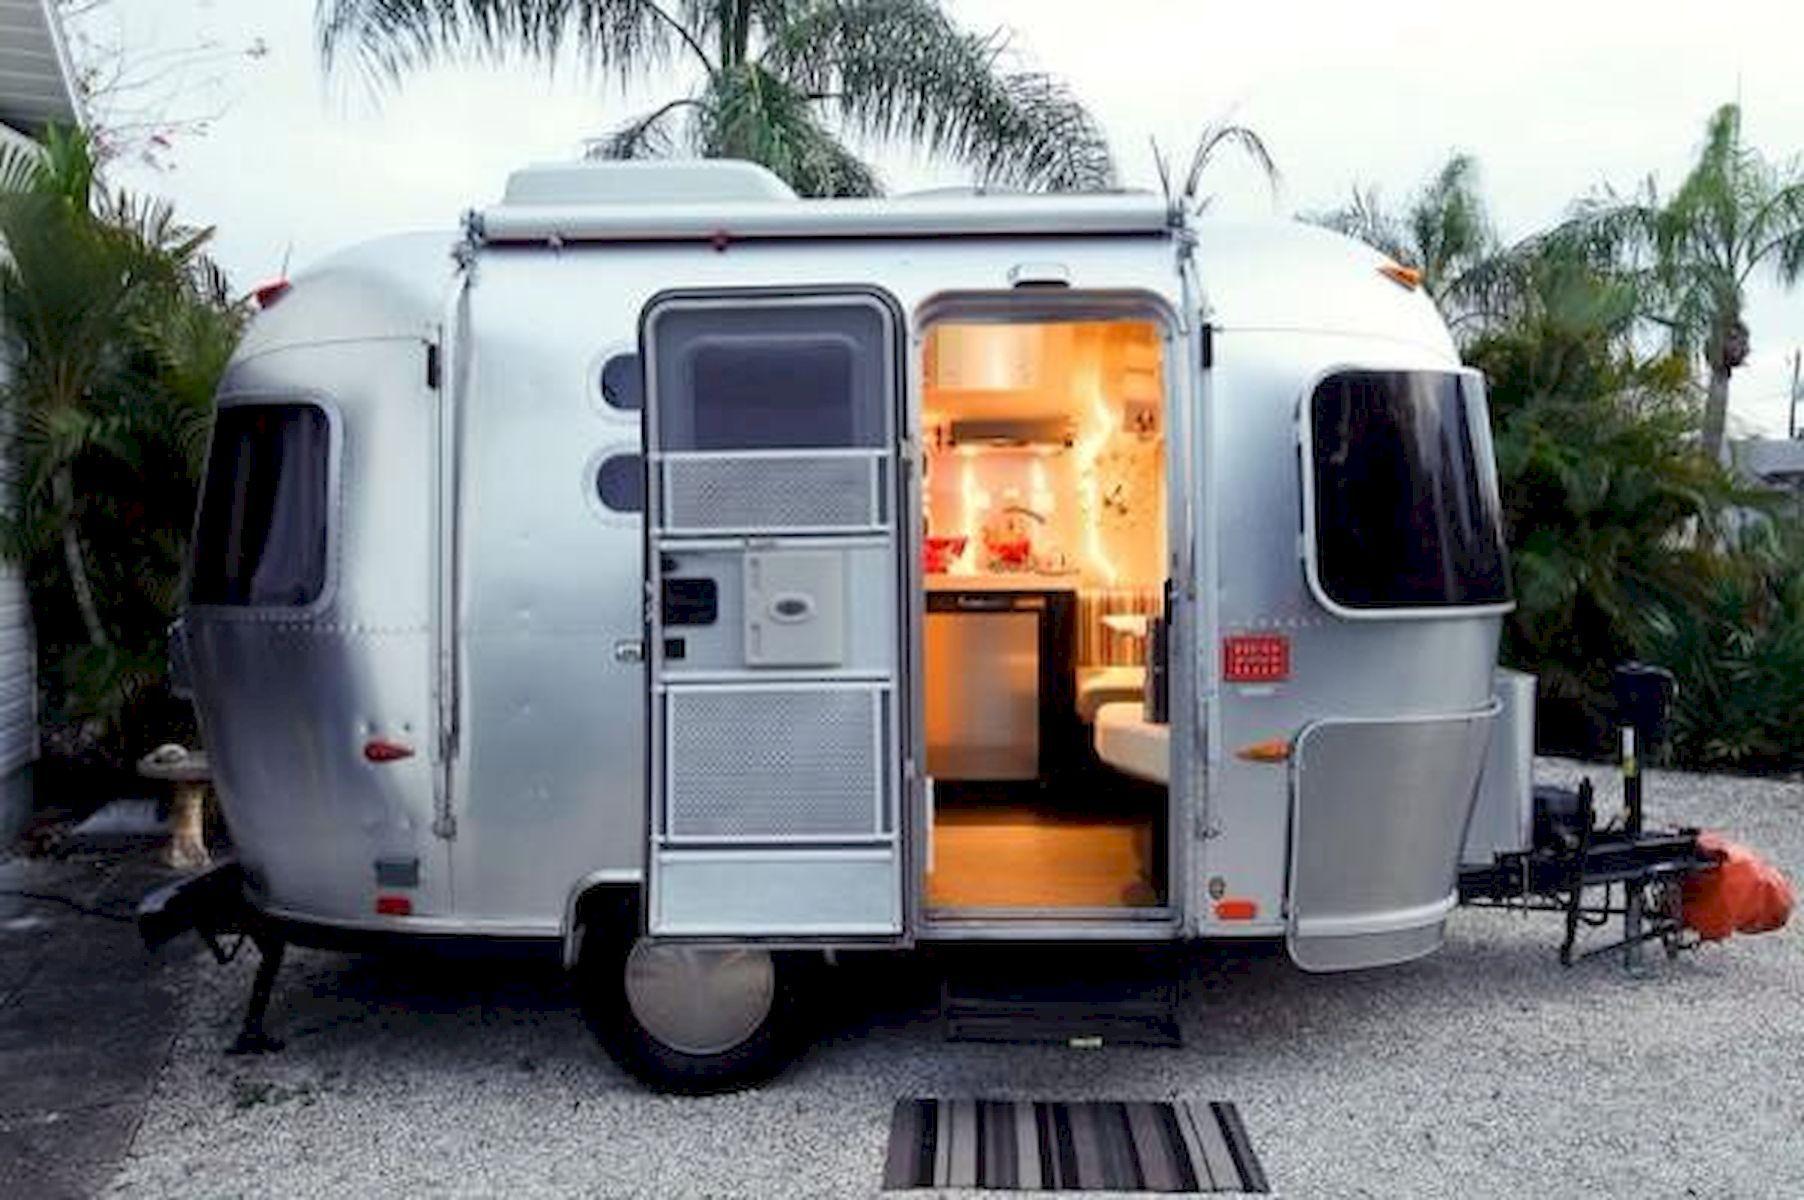 Solar Retro Modern Happier Camper HC1 Airstream bambi